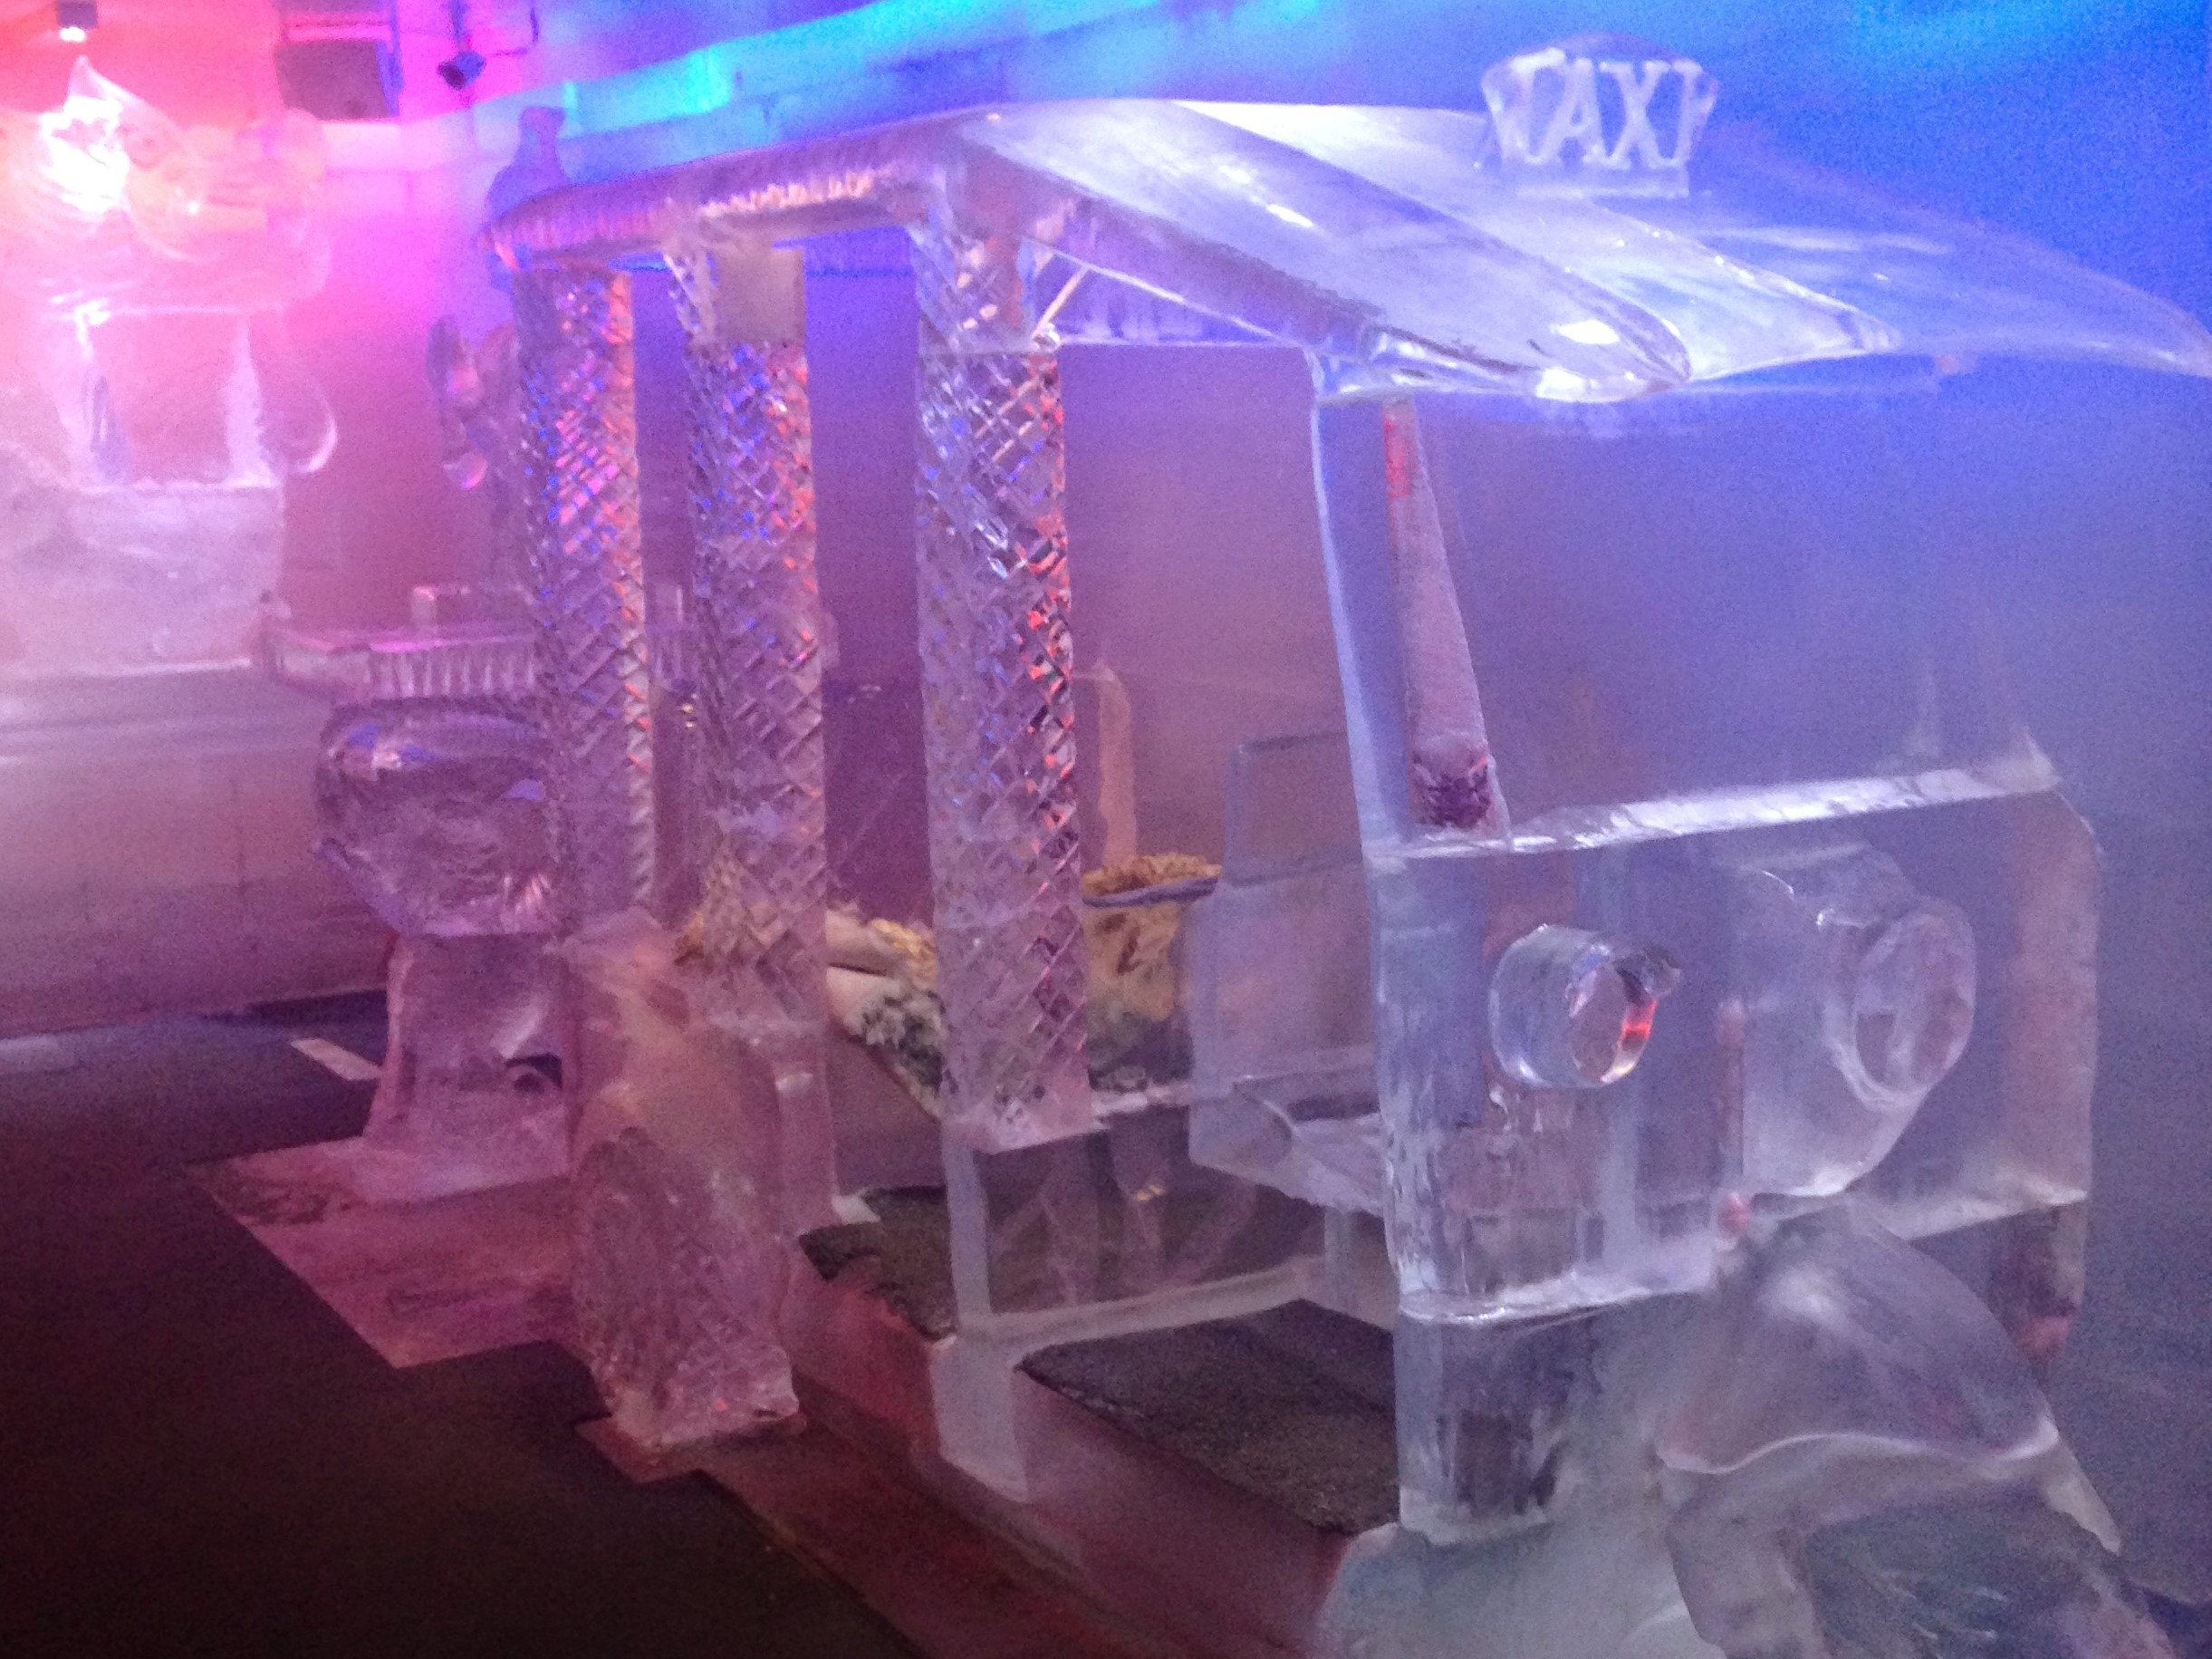 Ice, tuk tuk, ice tuk tuk, ice bar, koh samui, bar, ice sculpture, sculpture, thailand, travelling, travellers, travels, backpacking, backpackers, islands, island,